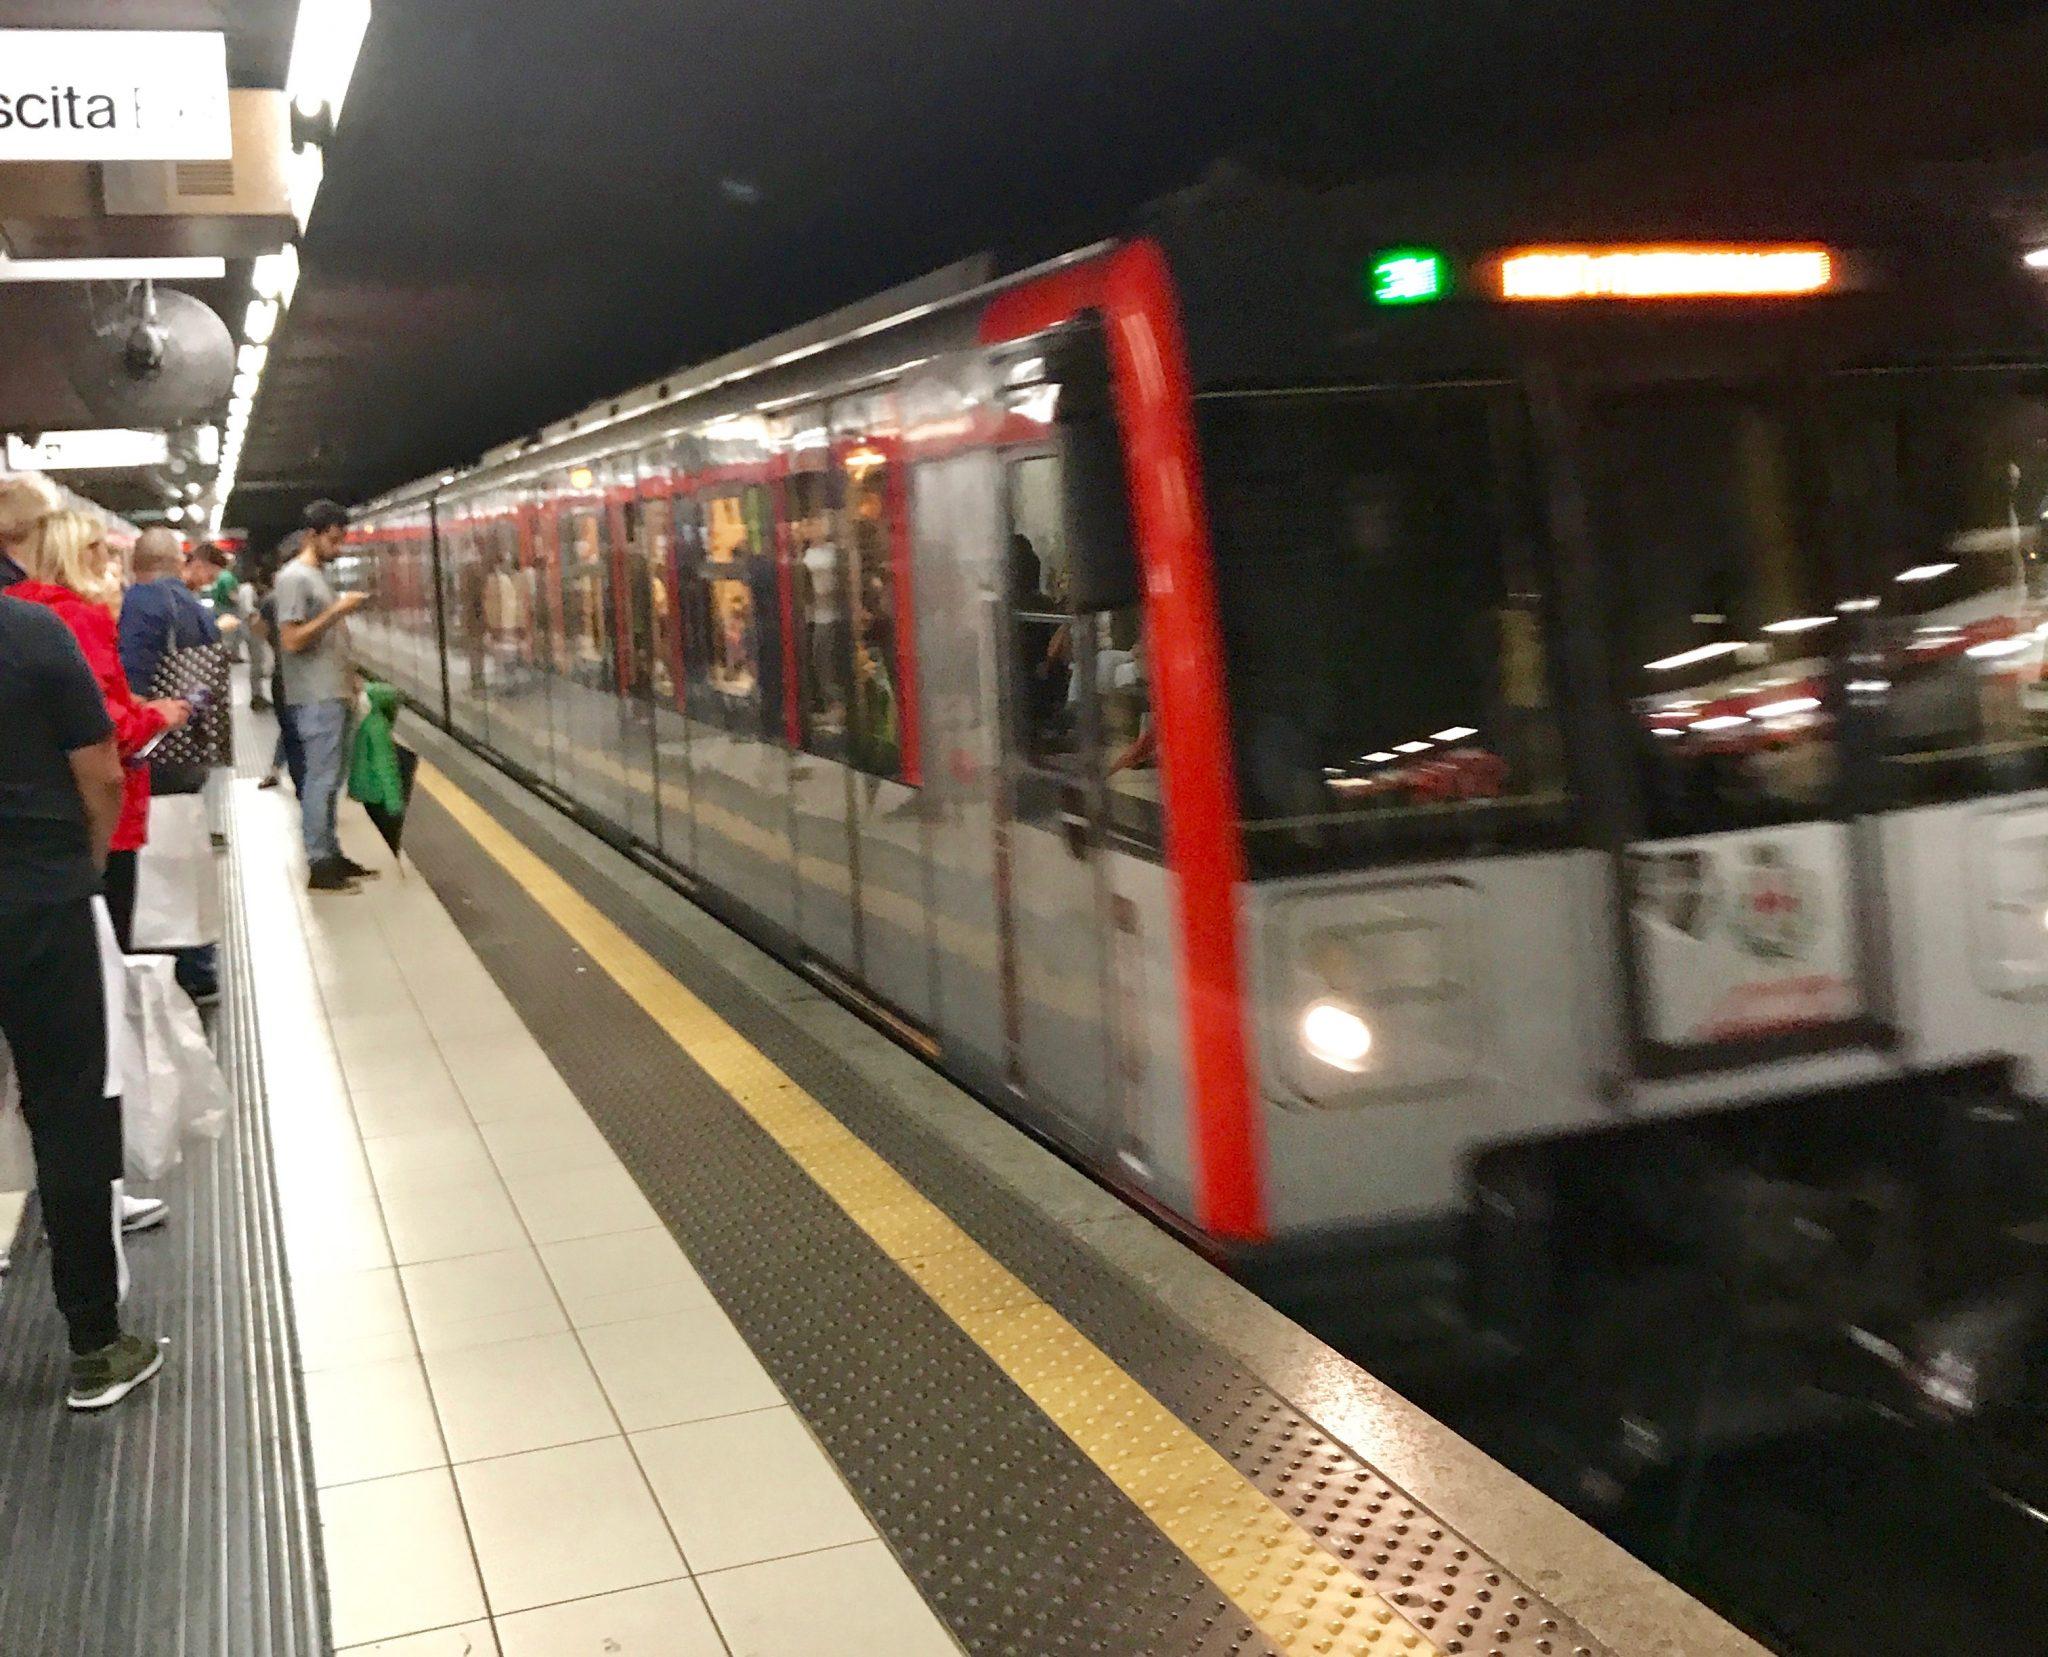 Mailand: Rote Linie M1 Bahngleis und Metro